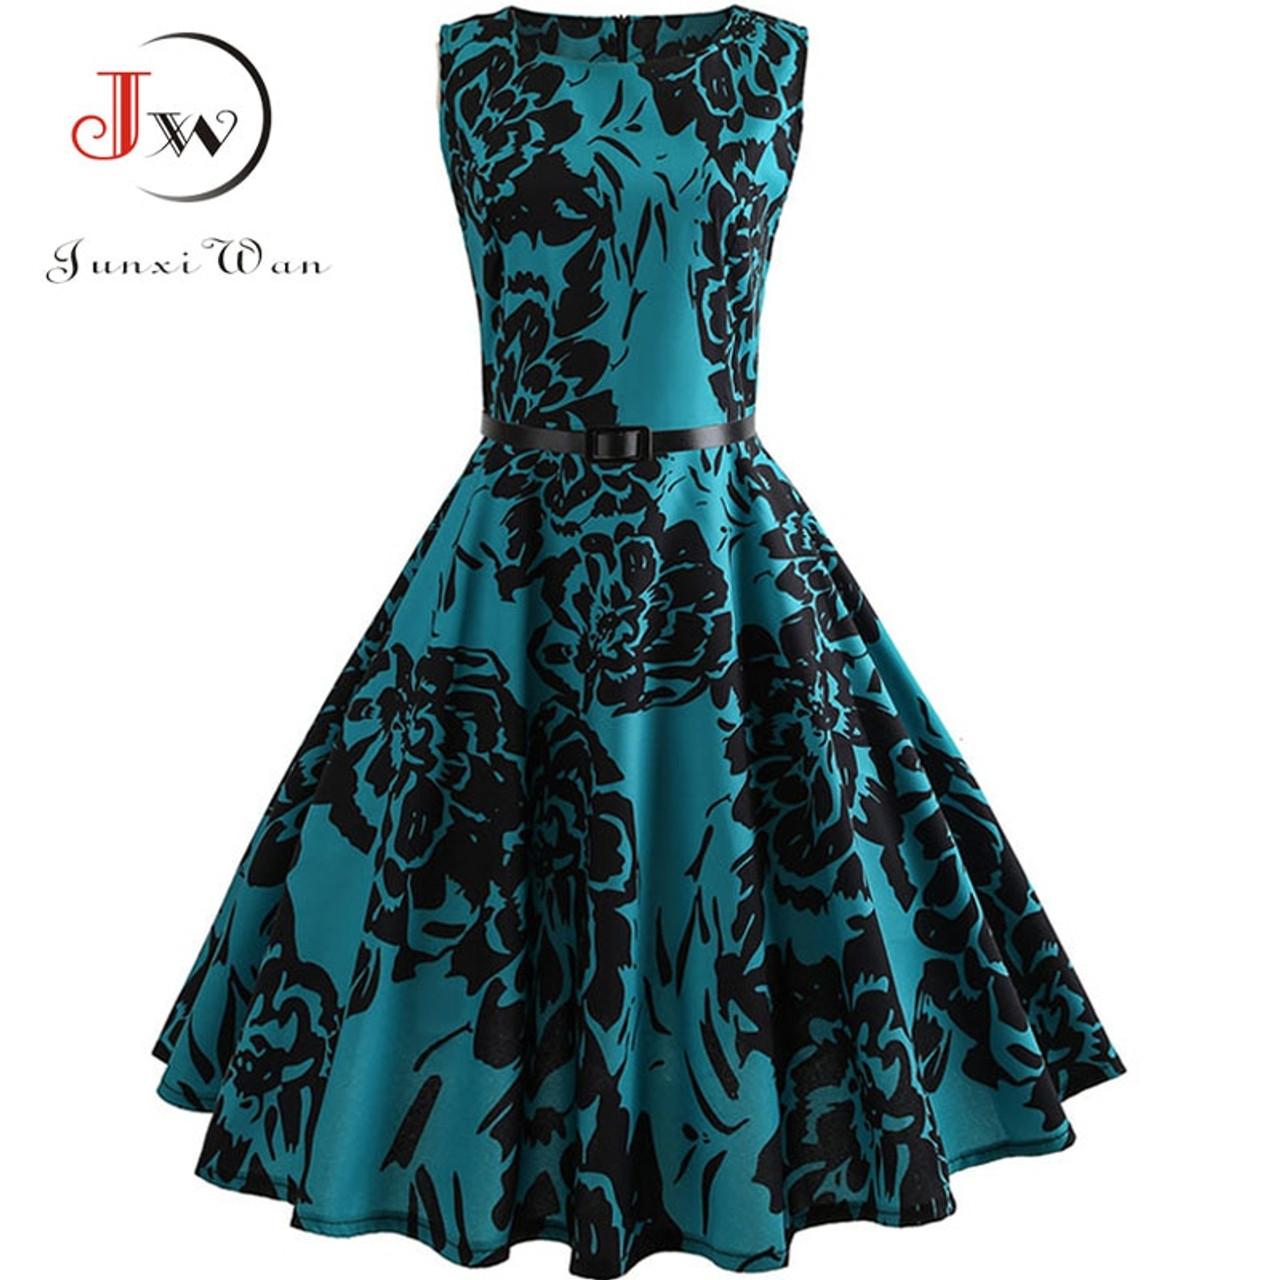 bd3807b859d5c Floral Print Summer Dress Women 2018 Vintage Elegant Swing Rockabilly Party  Dresses Plus Size Casual Midi Tunic Runway Dress